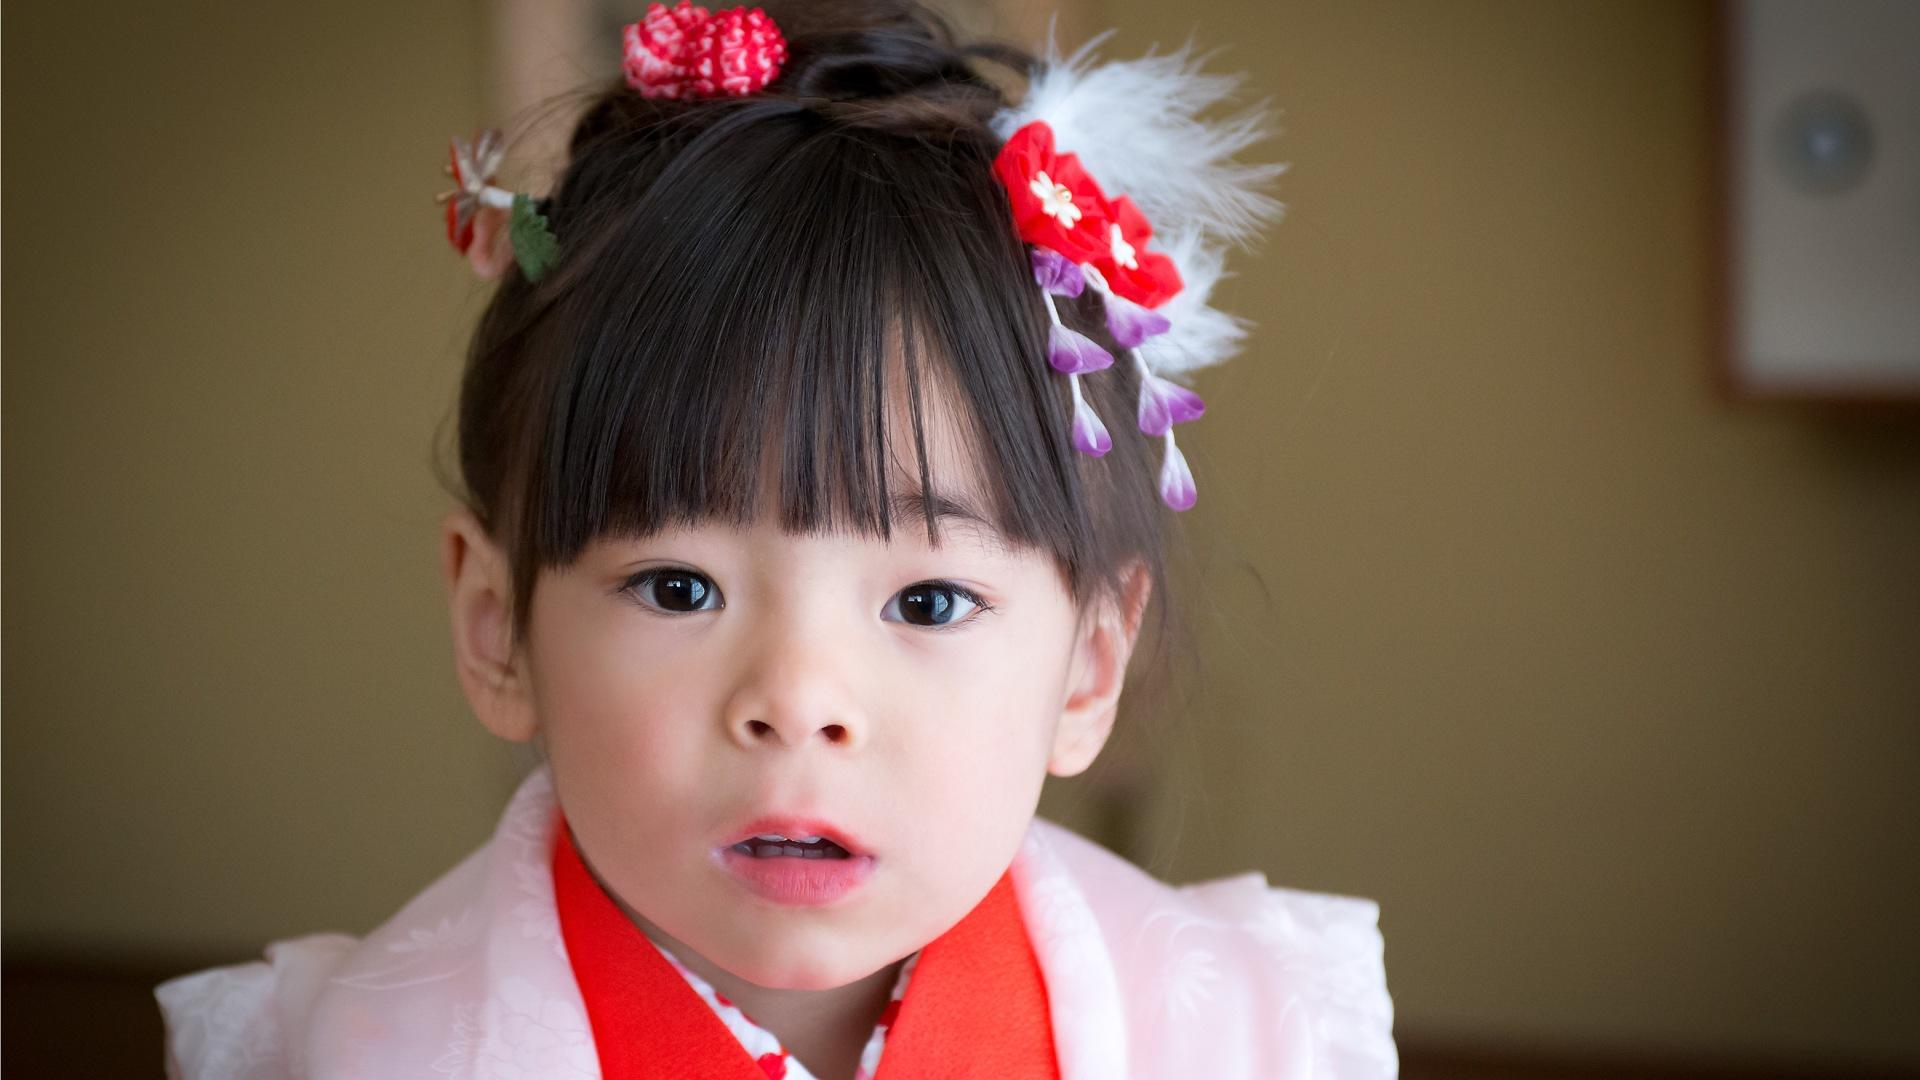 The stare, Shichi Go San Photography in Los Angele, 3 years old girl in red kimono, Japanese children's growth celebration, 753, Kodomo no Ie San Gabriel Pasadena, Kimono no Kobeya,